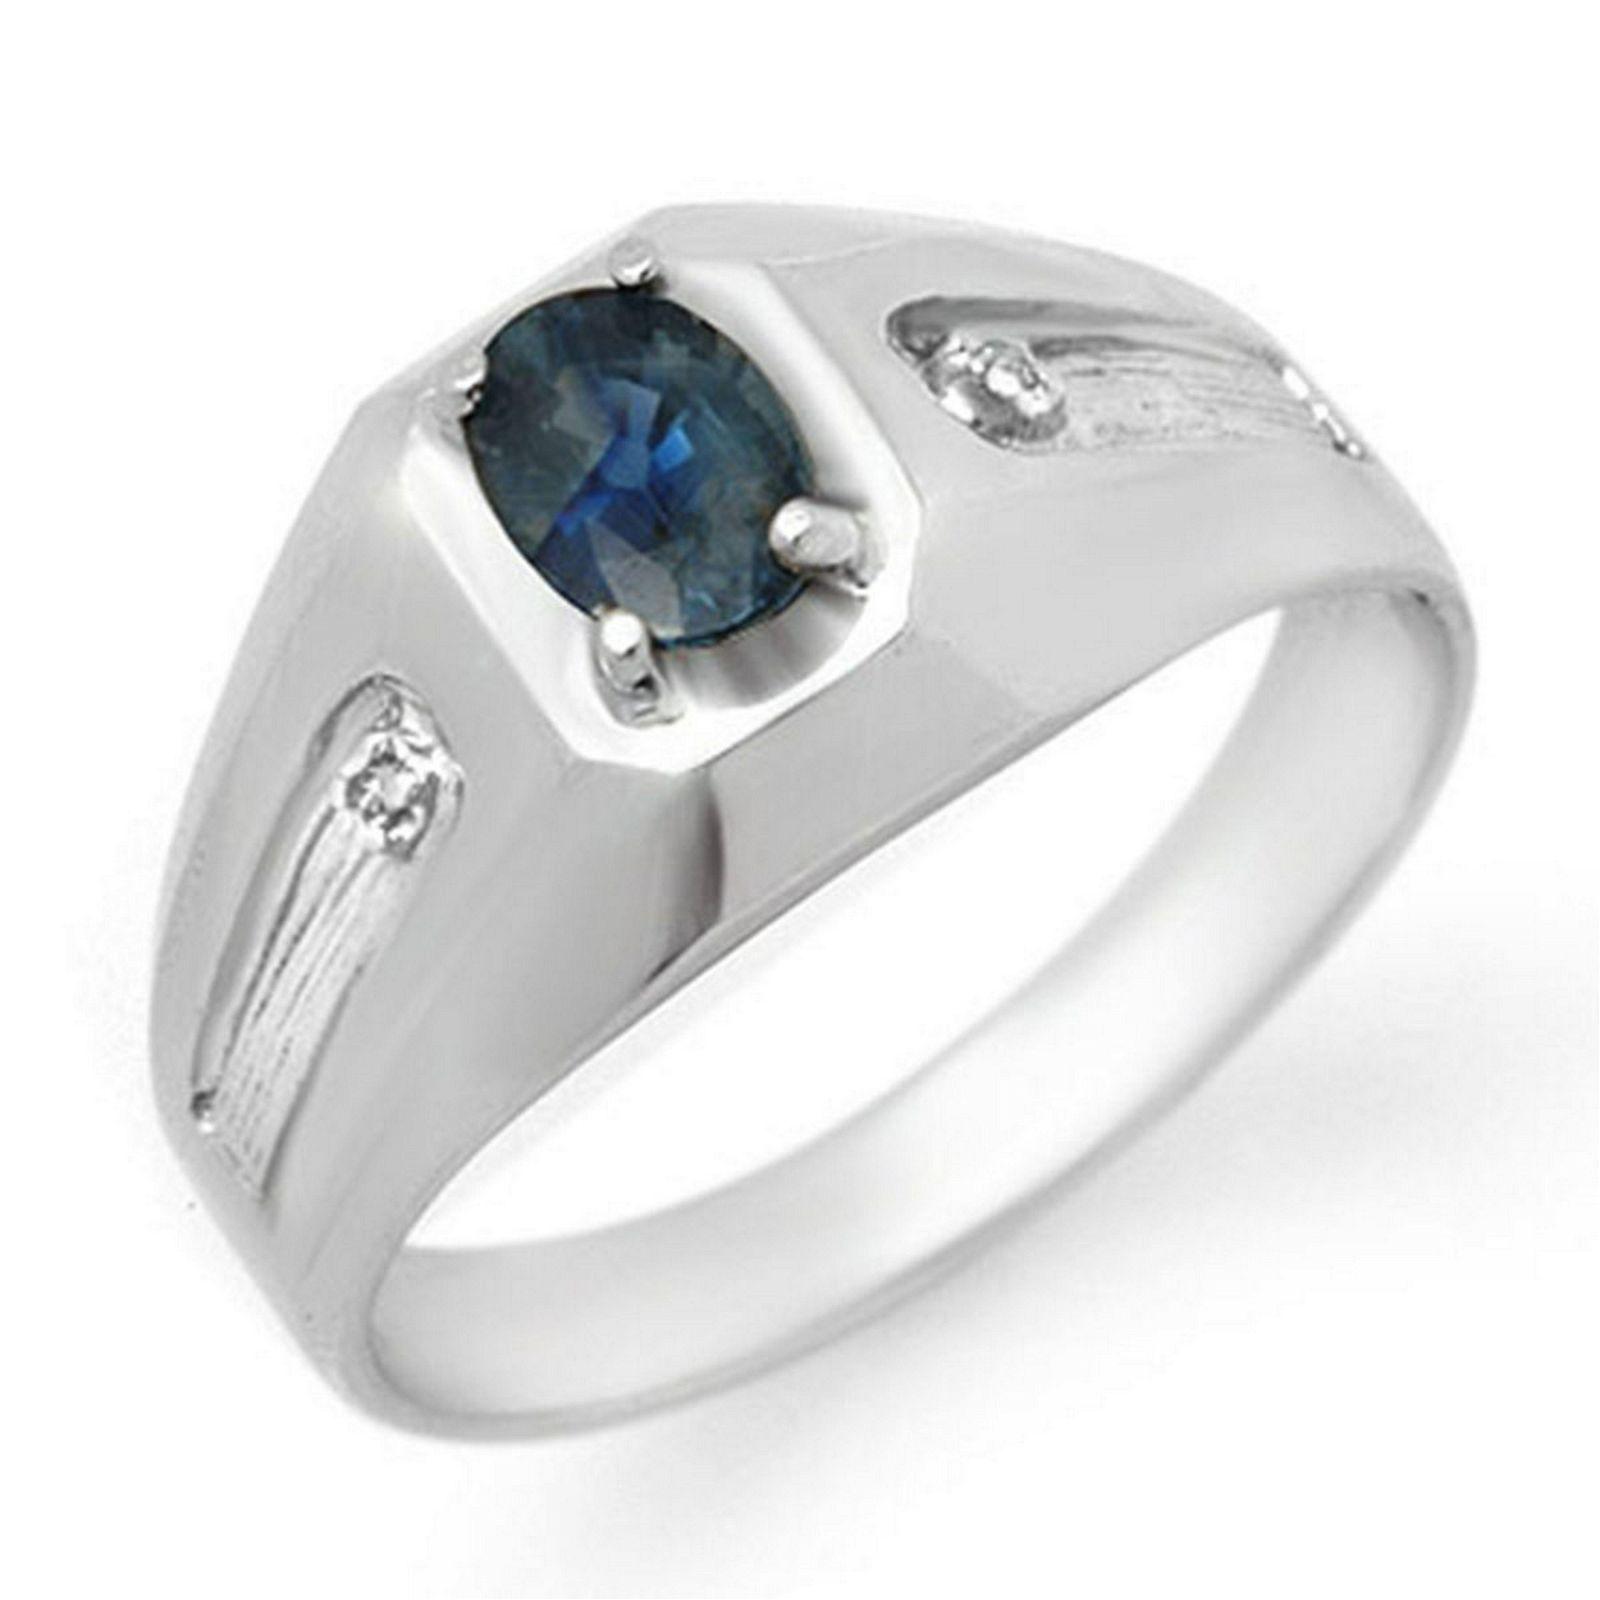 0.68 CTW Genuine Blue Sapphire & Diamond Men's Ring 10K